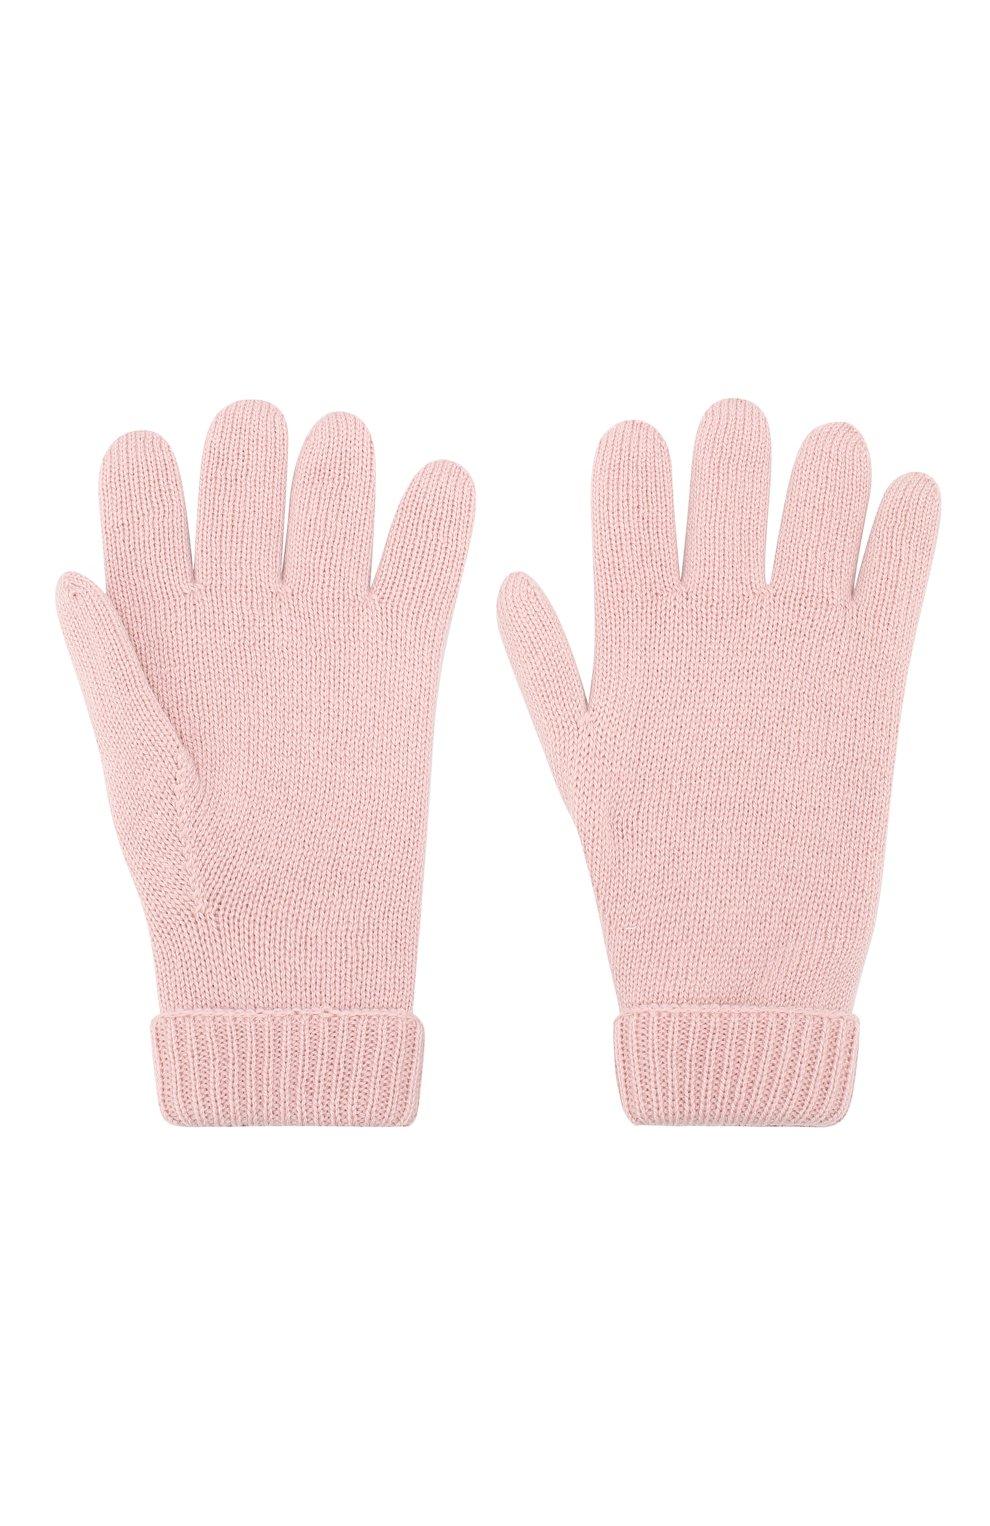 Детские шерстяные перчатки IL TRENINO розового цвета, арт. 19 9008/E0   Фото 2